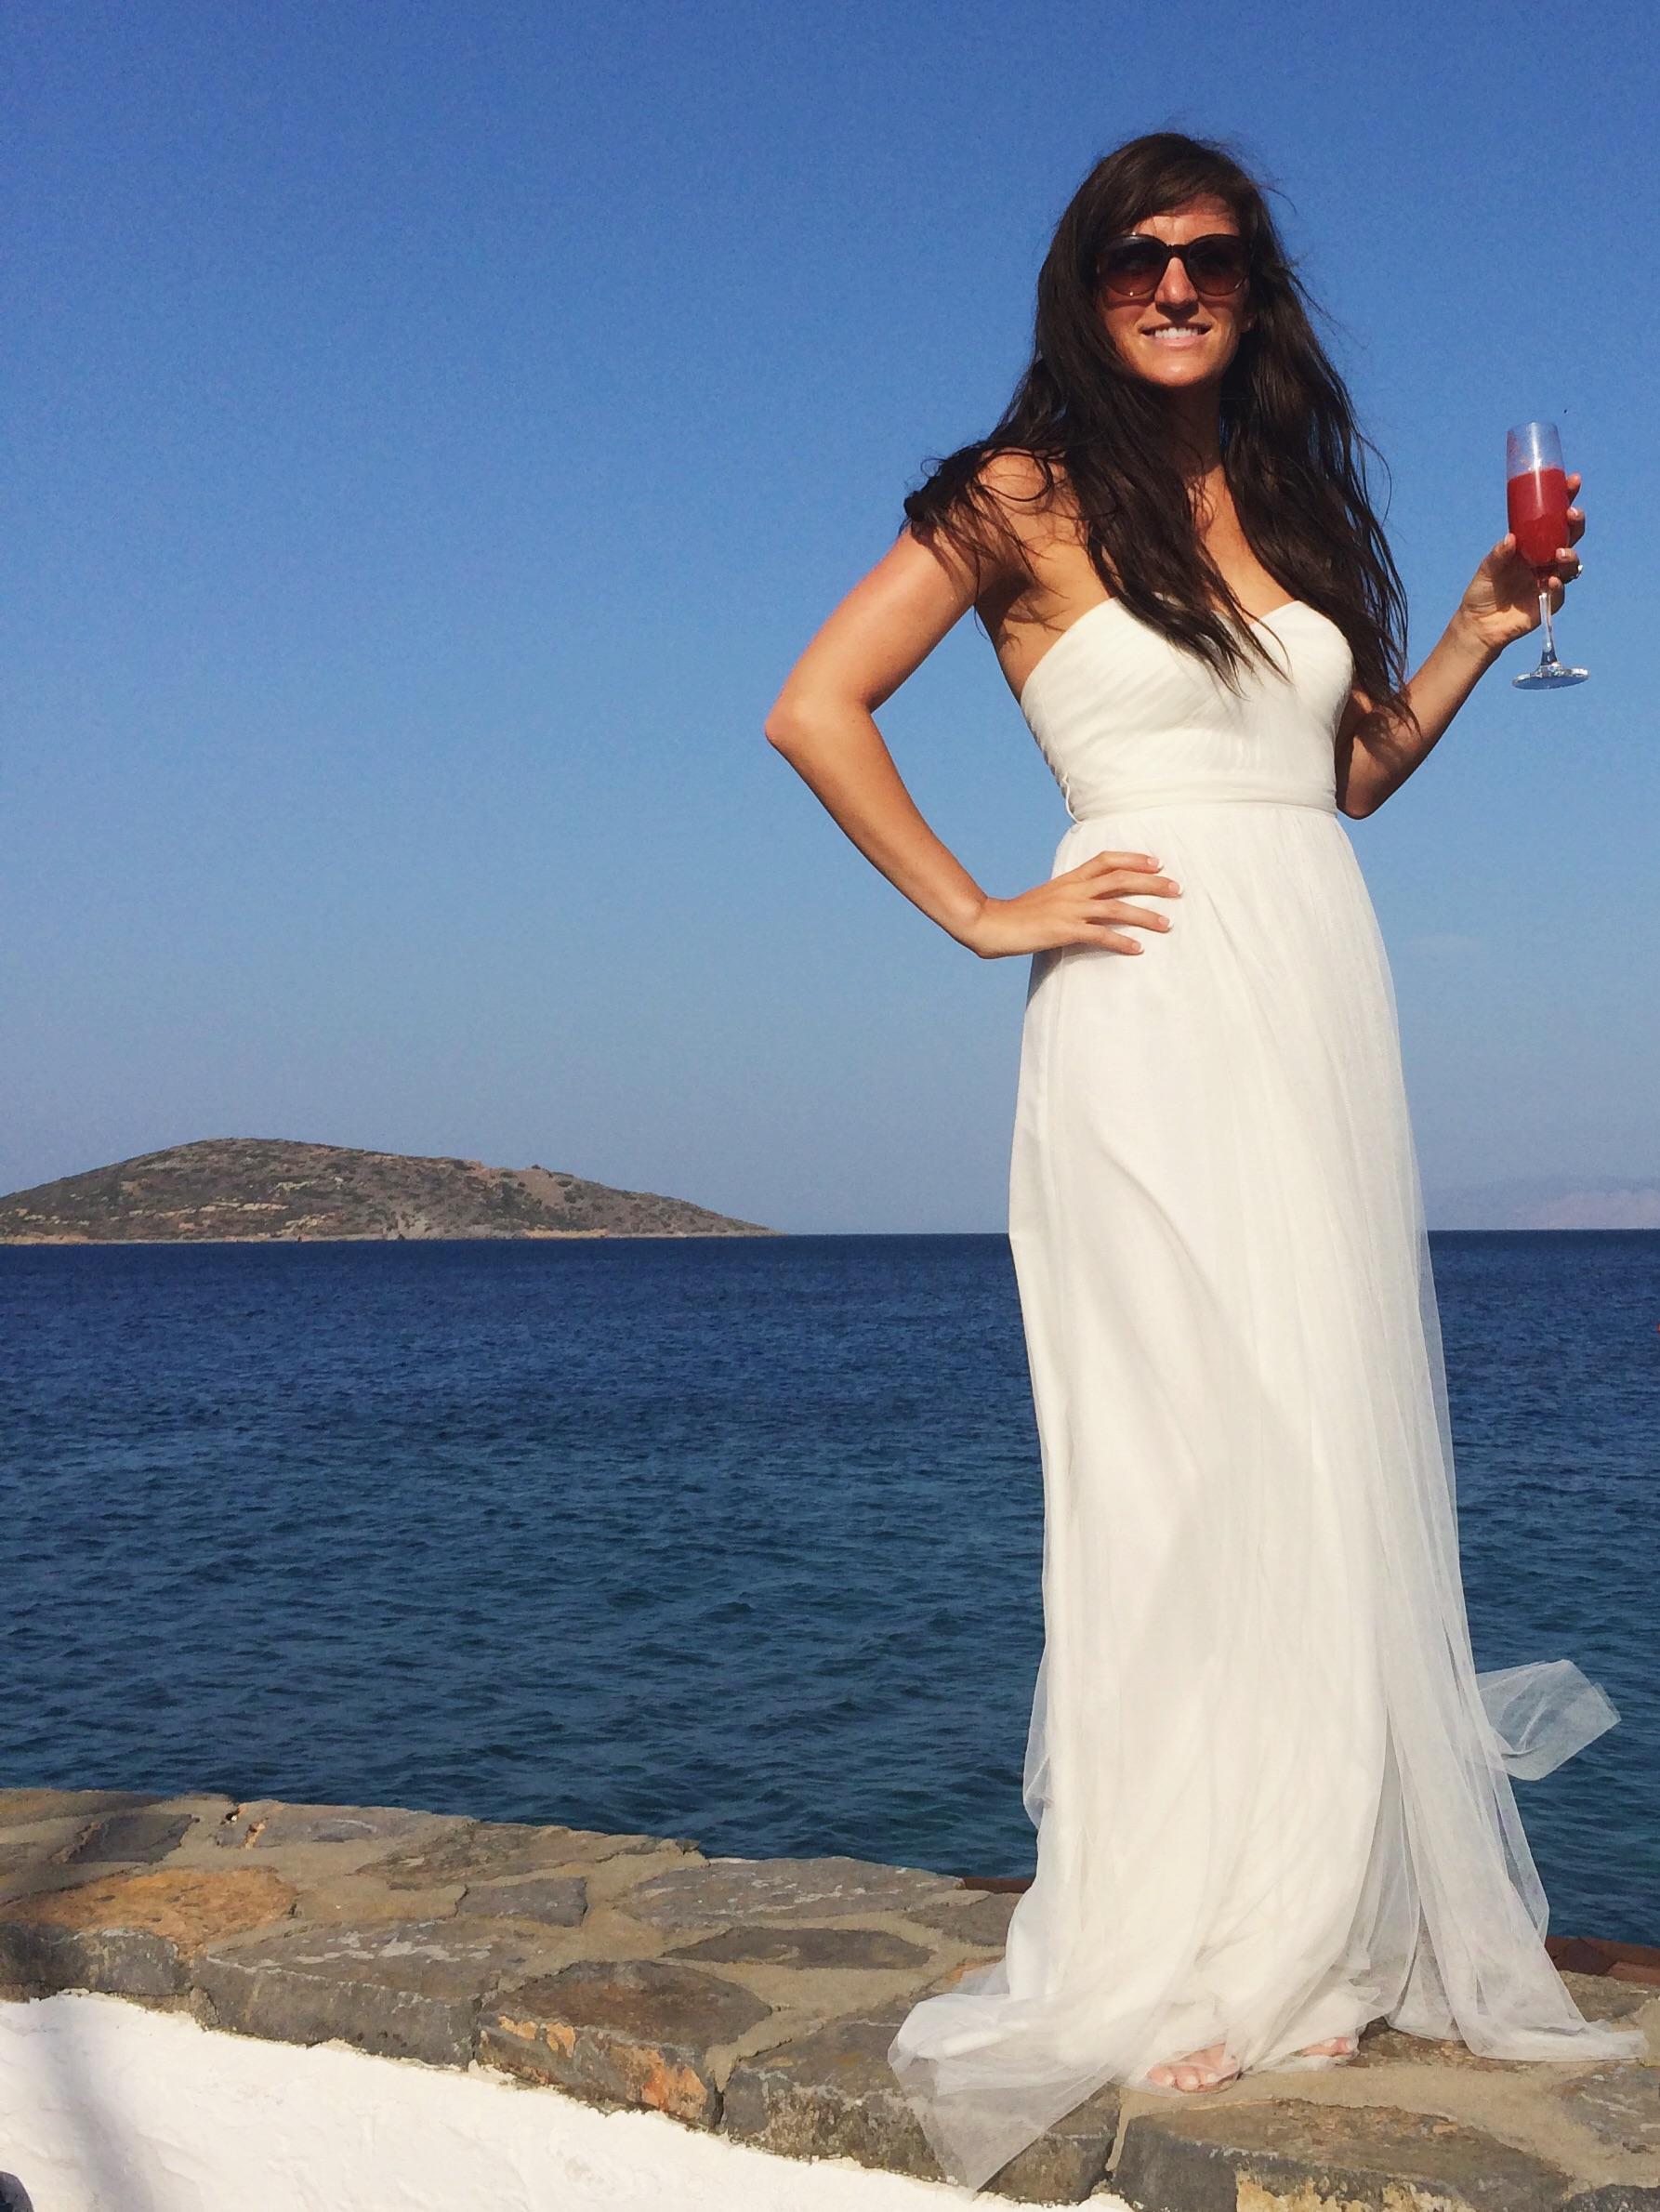 Elounda Bay, Crete with champagne